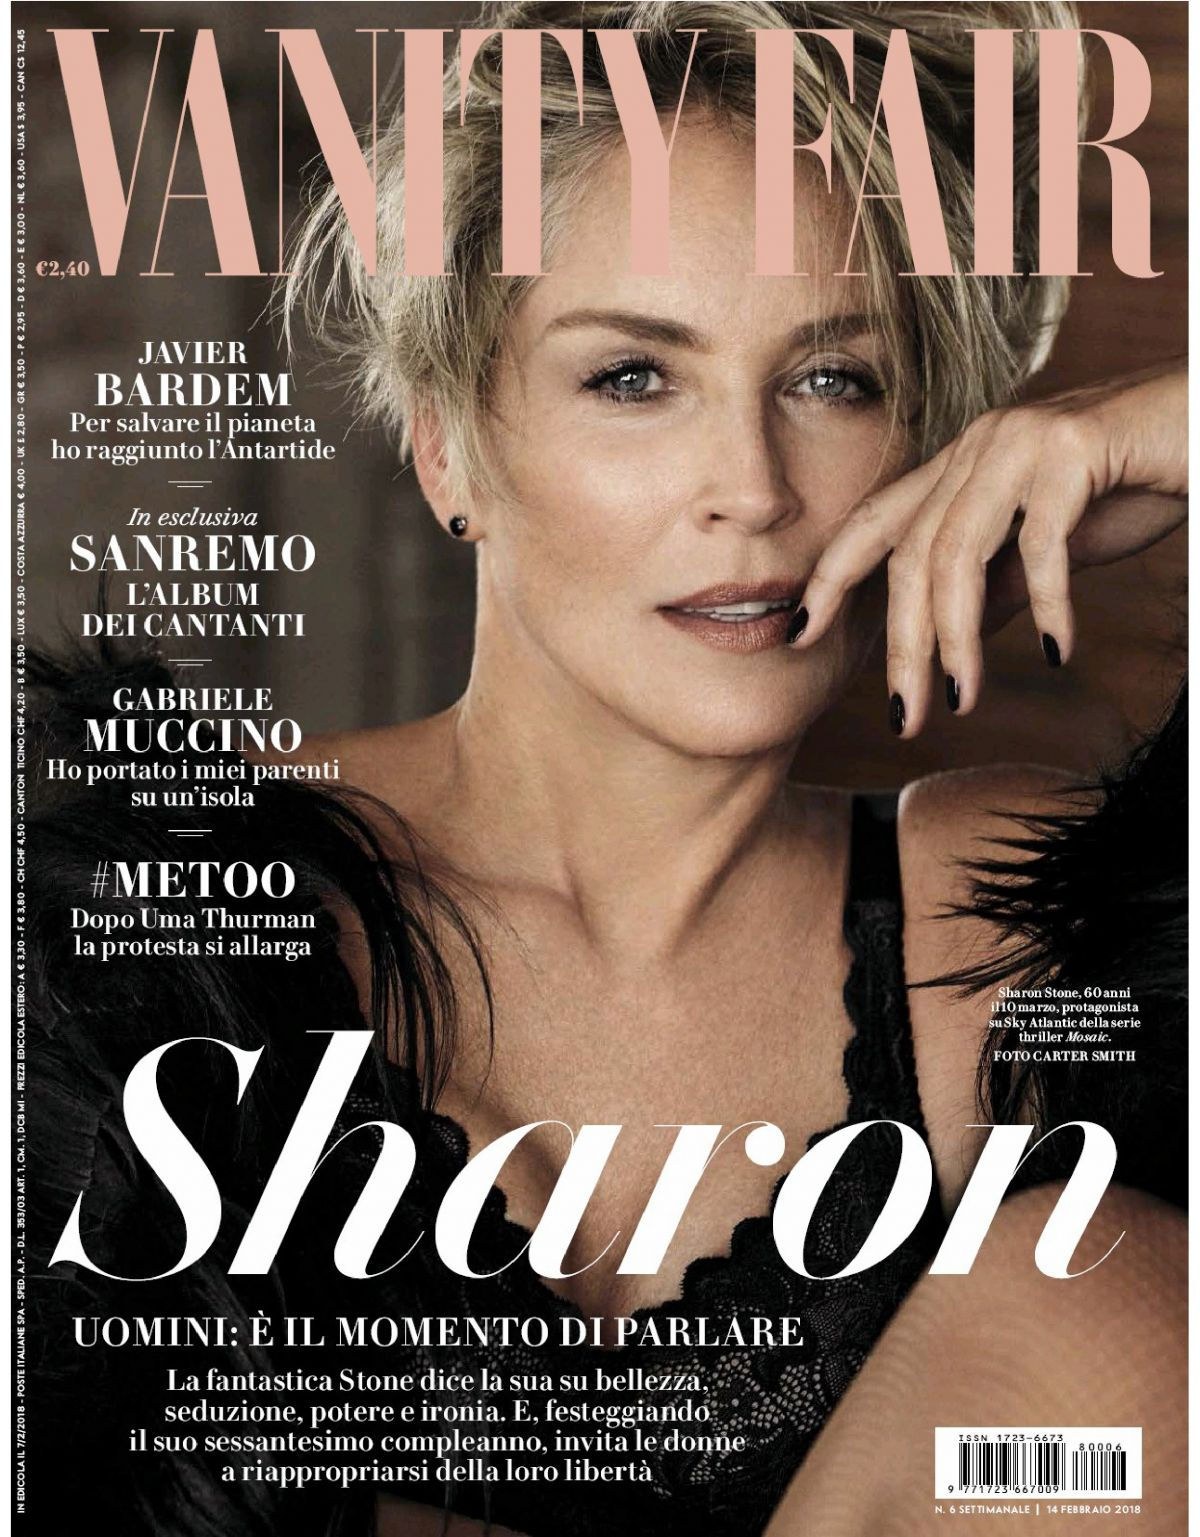 Lovely SHARON STONE In Vanity Fair Magazine, February 2018 Issue